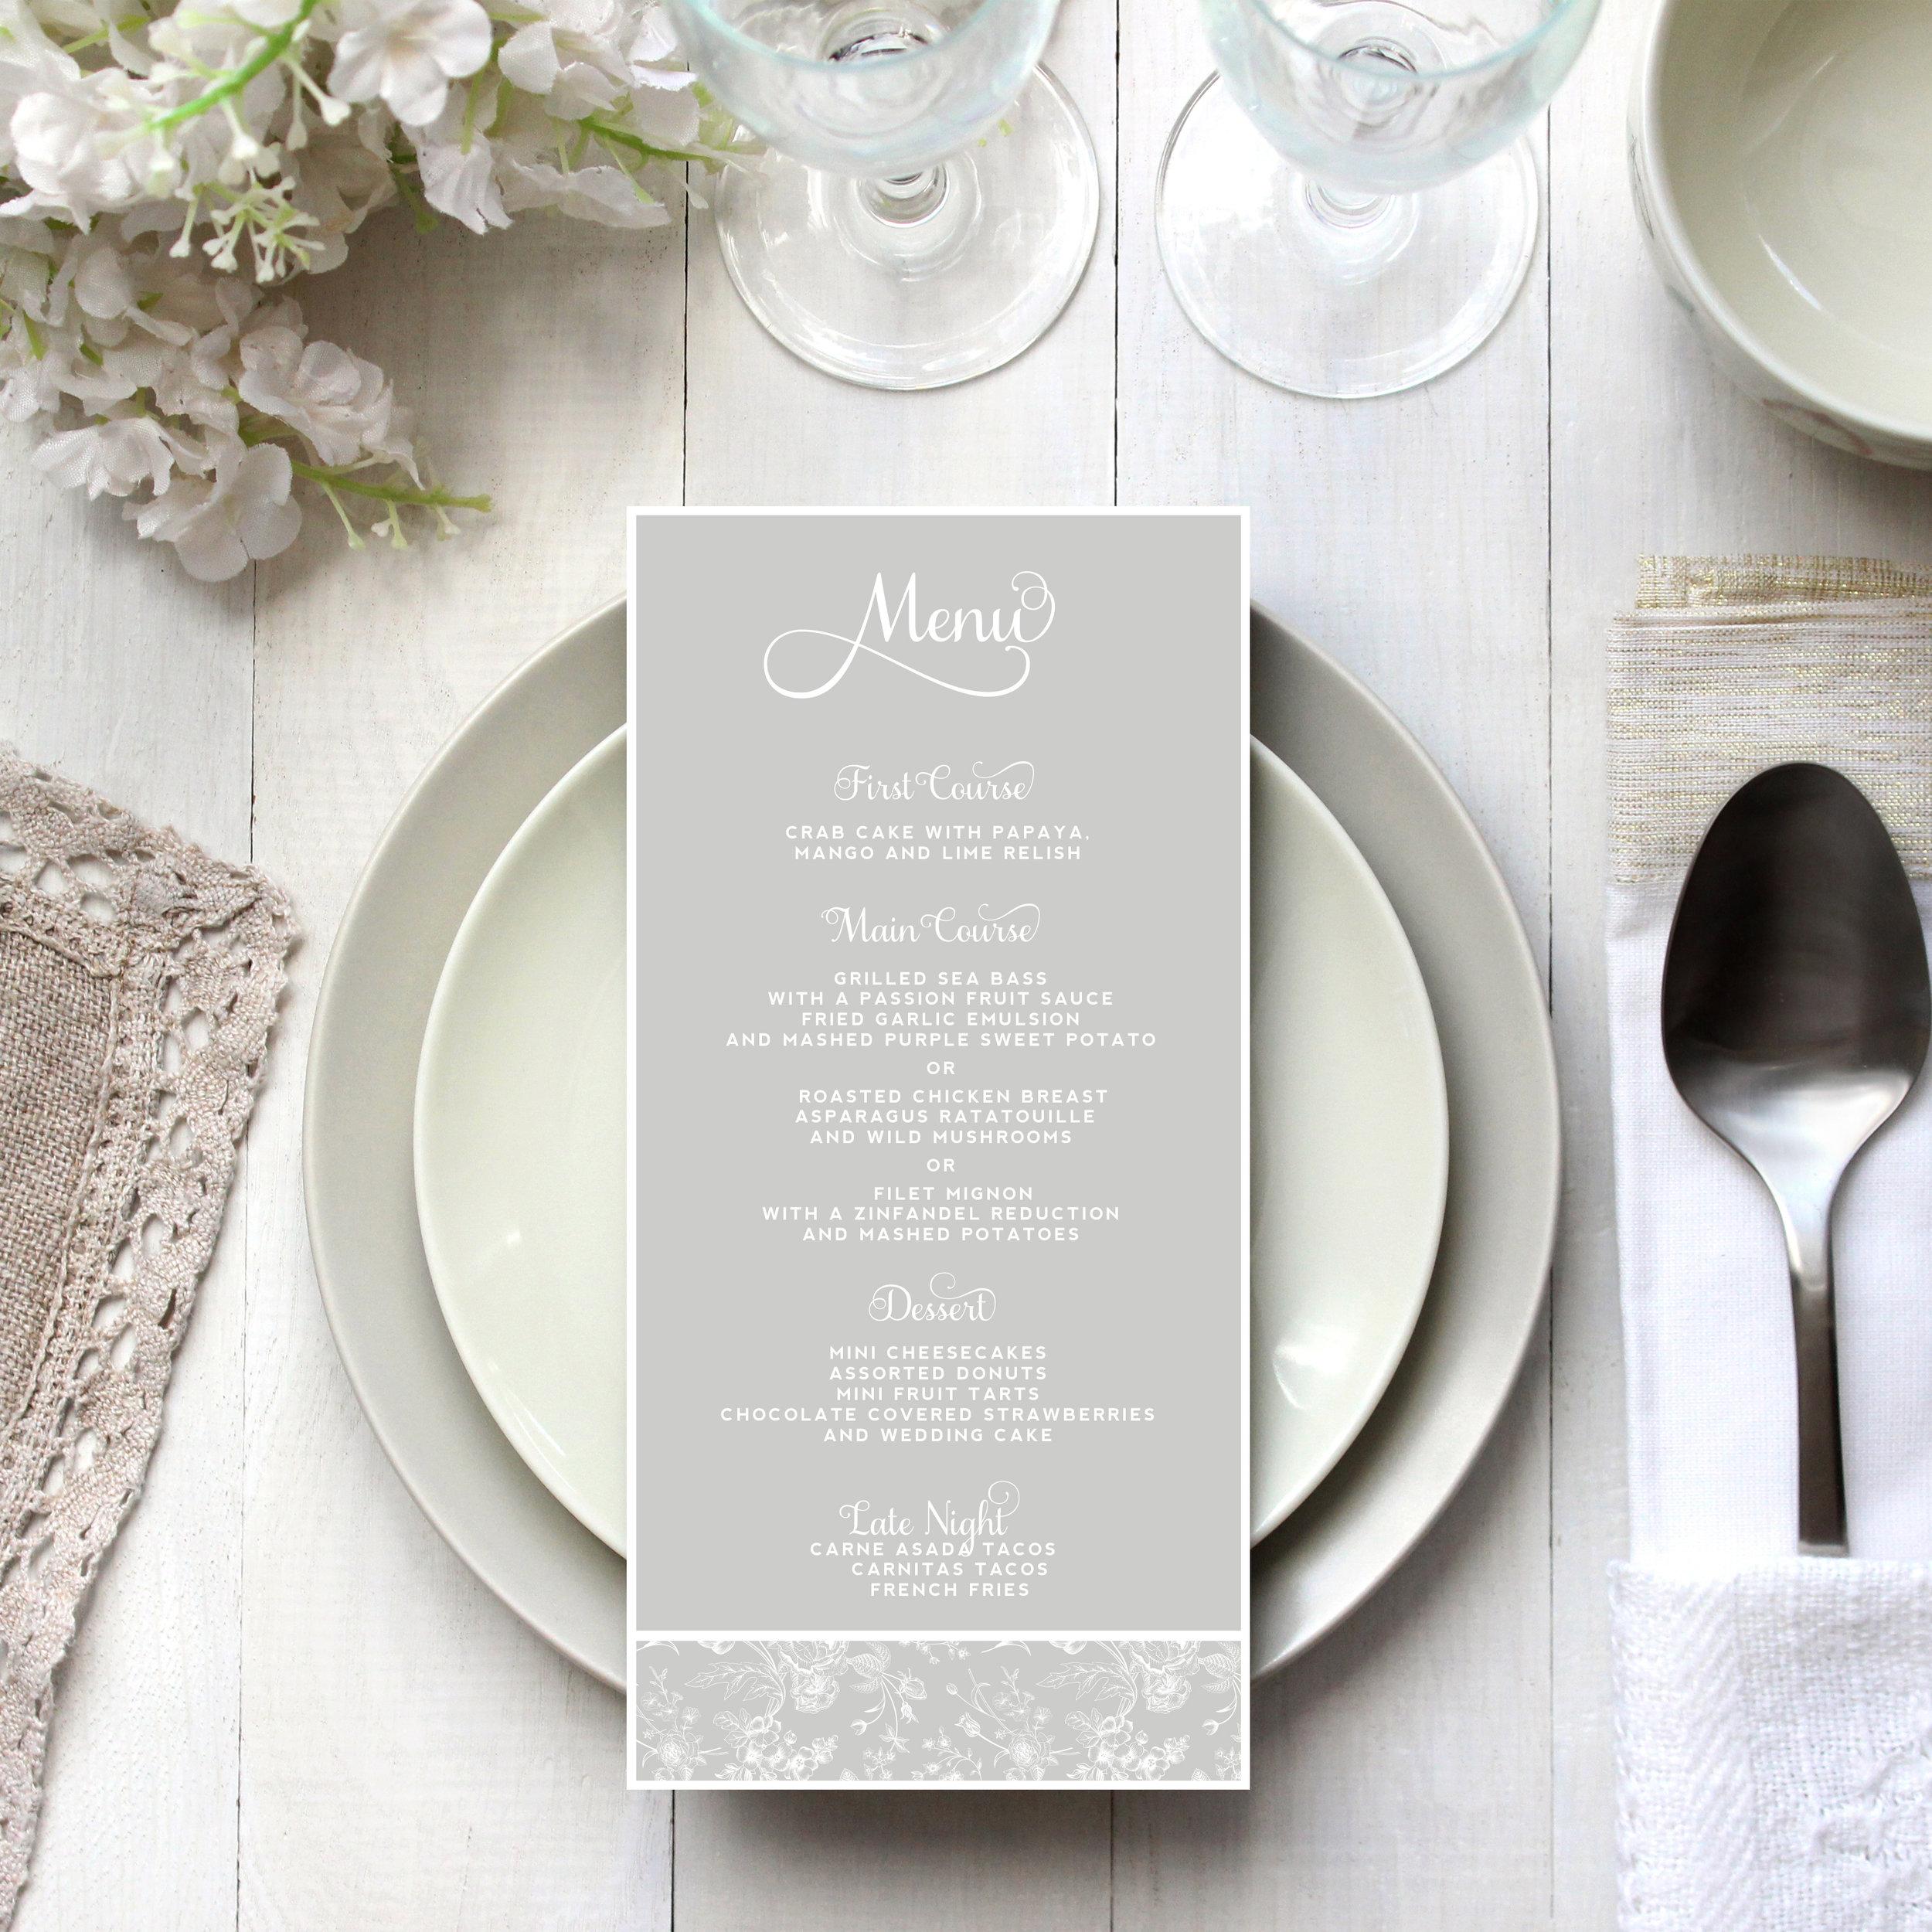 menu card shutterstock_420184768 copy.jpg